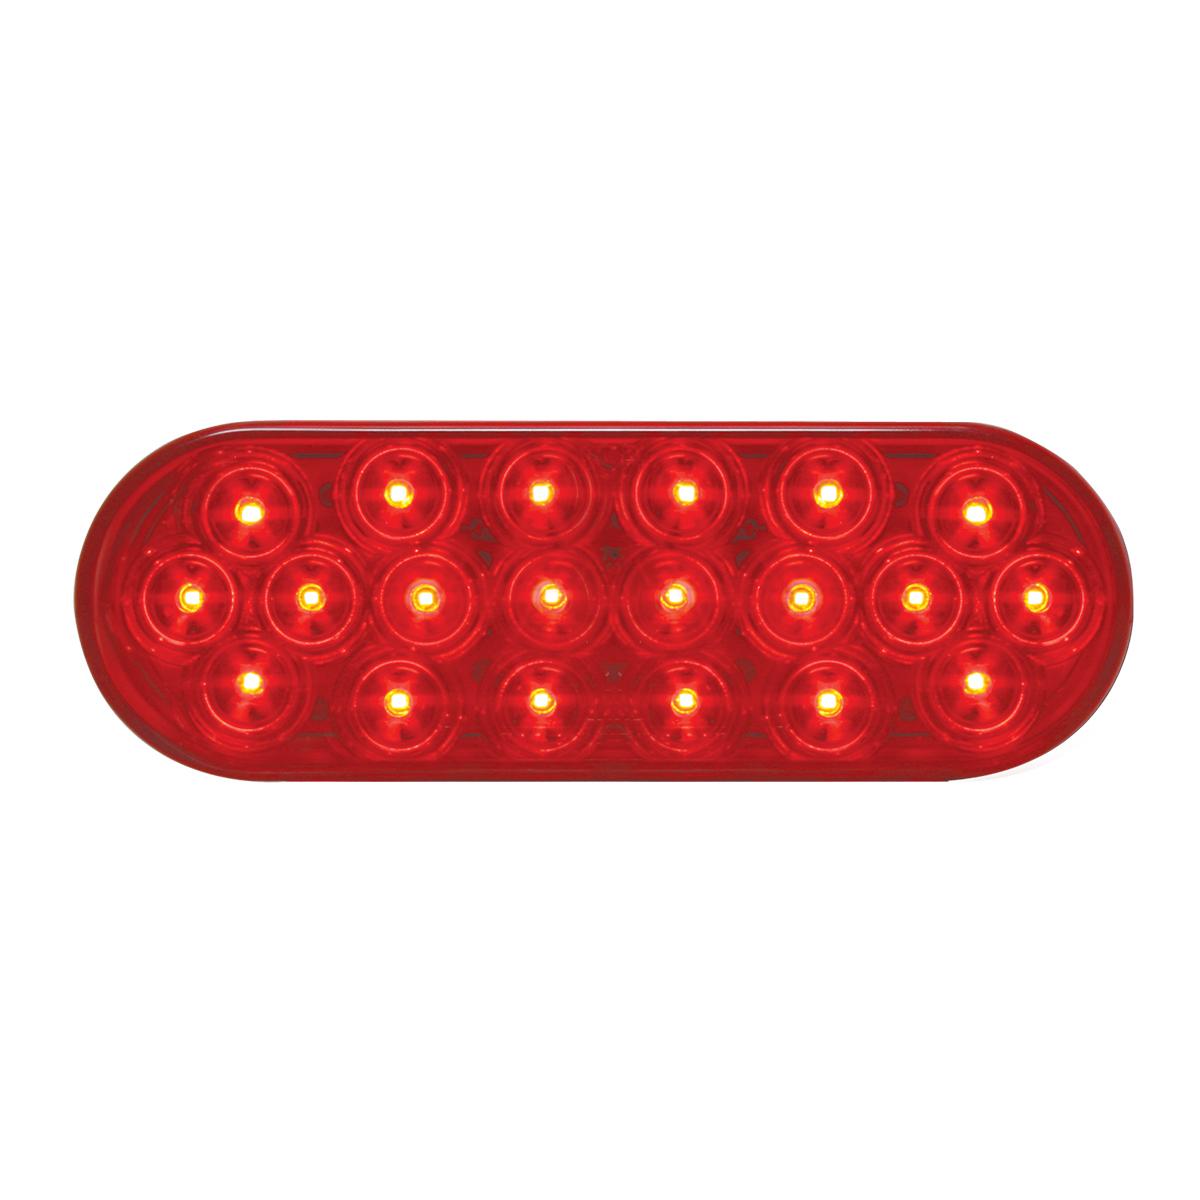 #87721 - Oval Fleet LED Flat Red/Red Light - Slanted